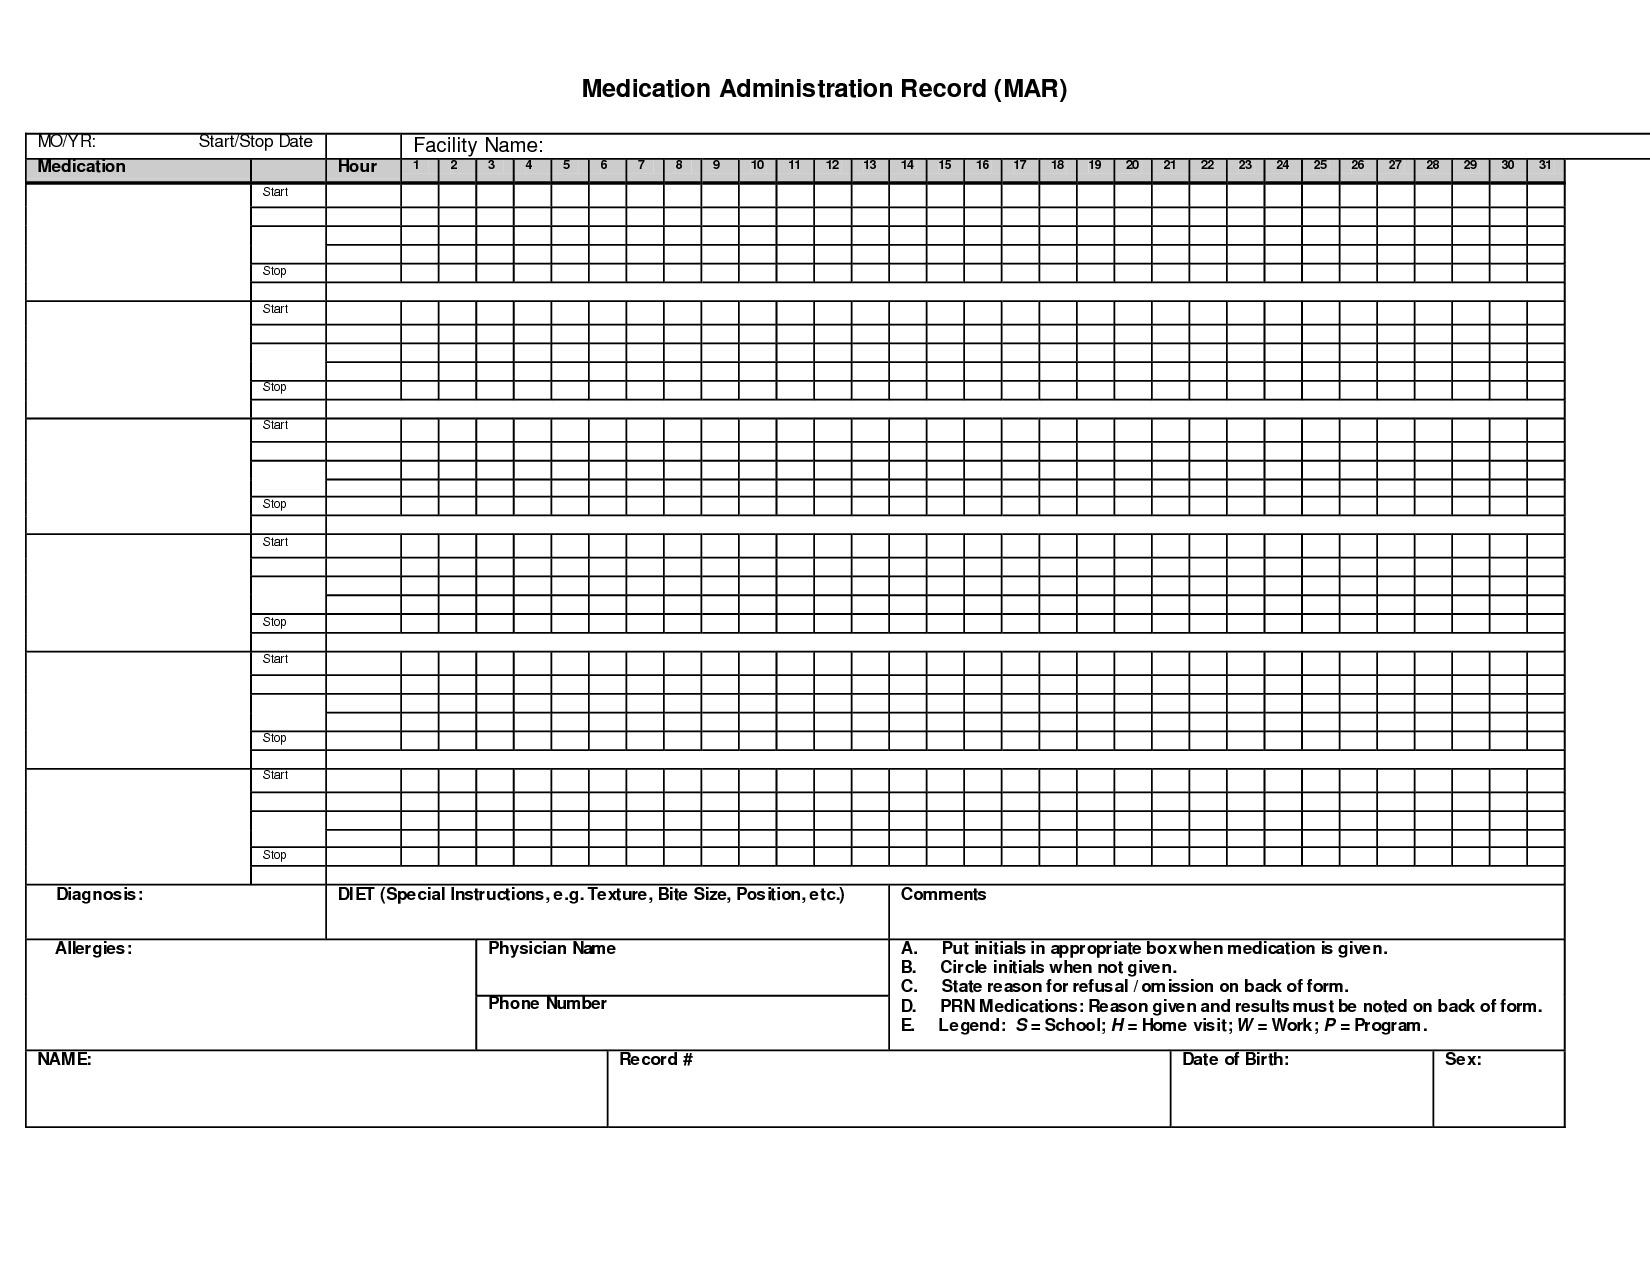 Medication Spreadsheet Organizer Spreadsheet Downloa Free